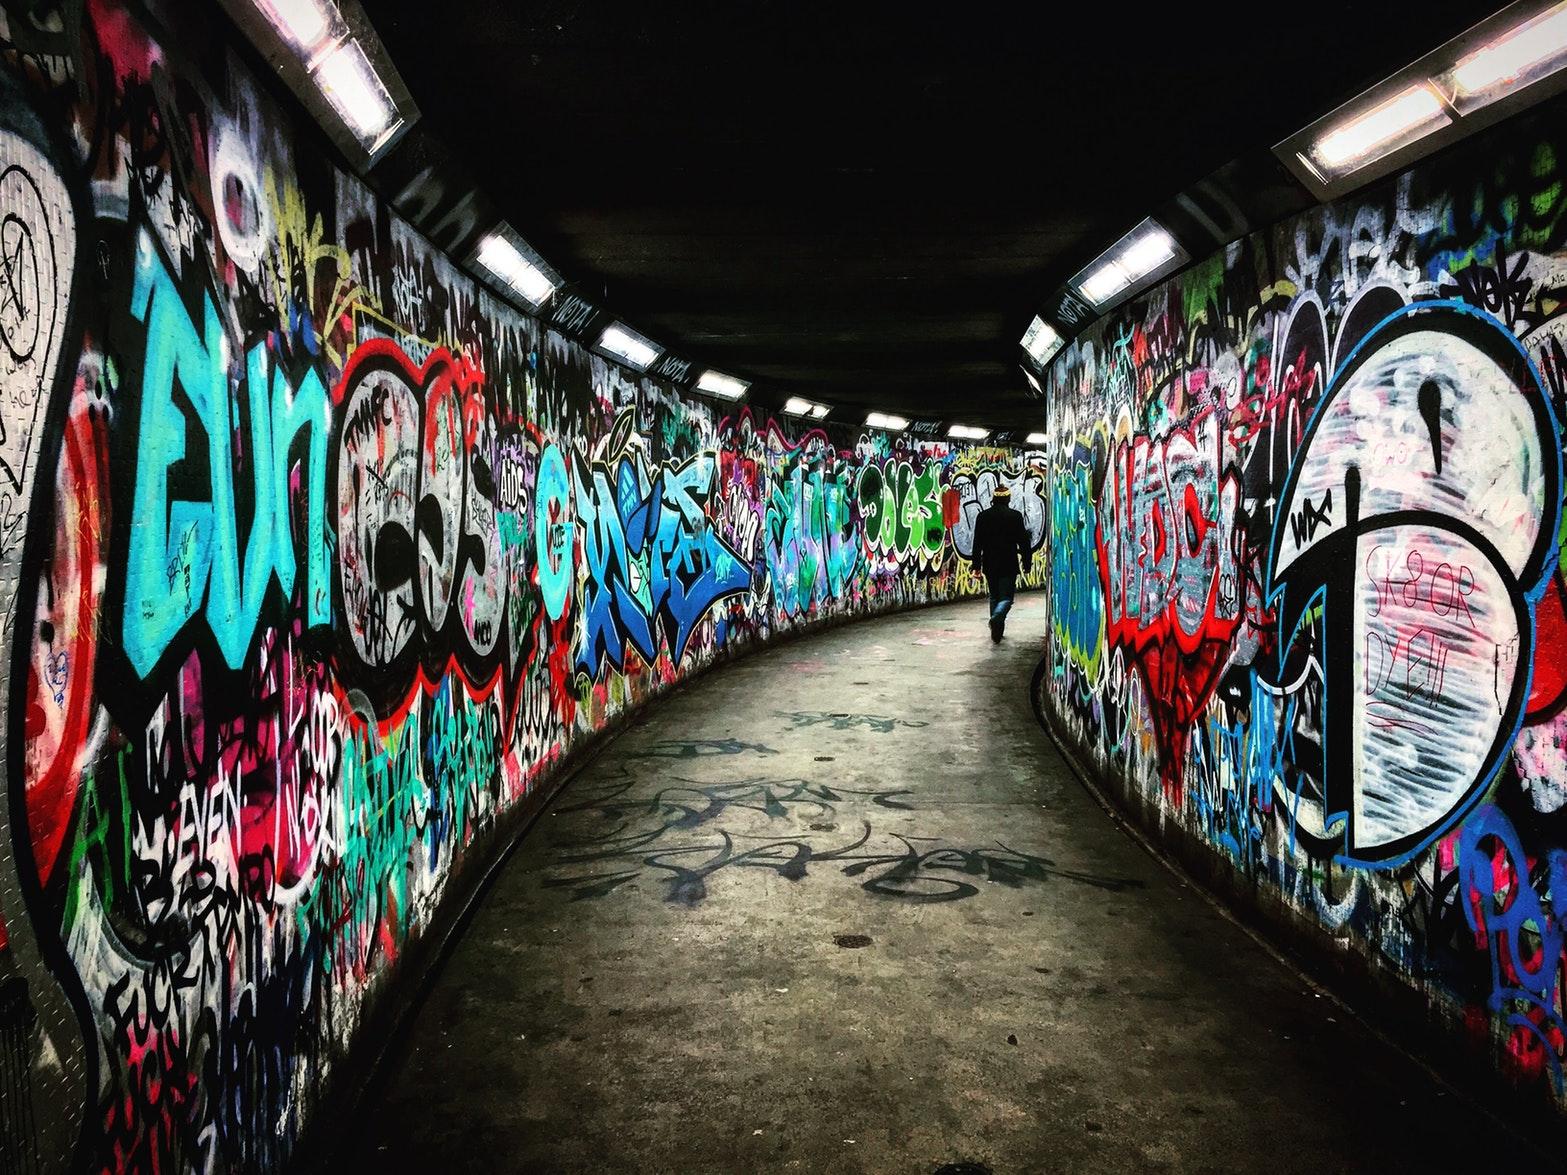 man walking on hallway with graffiti walls